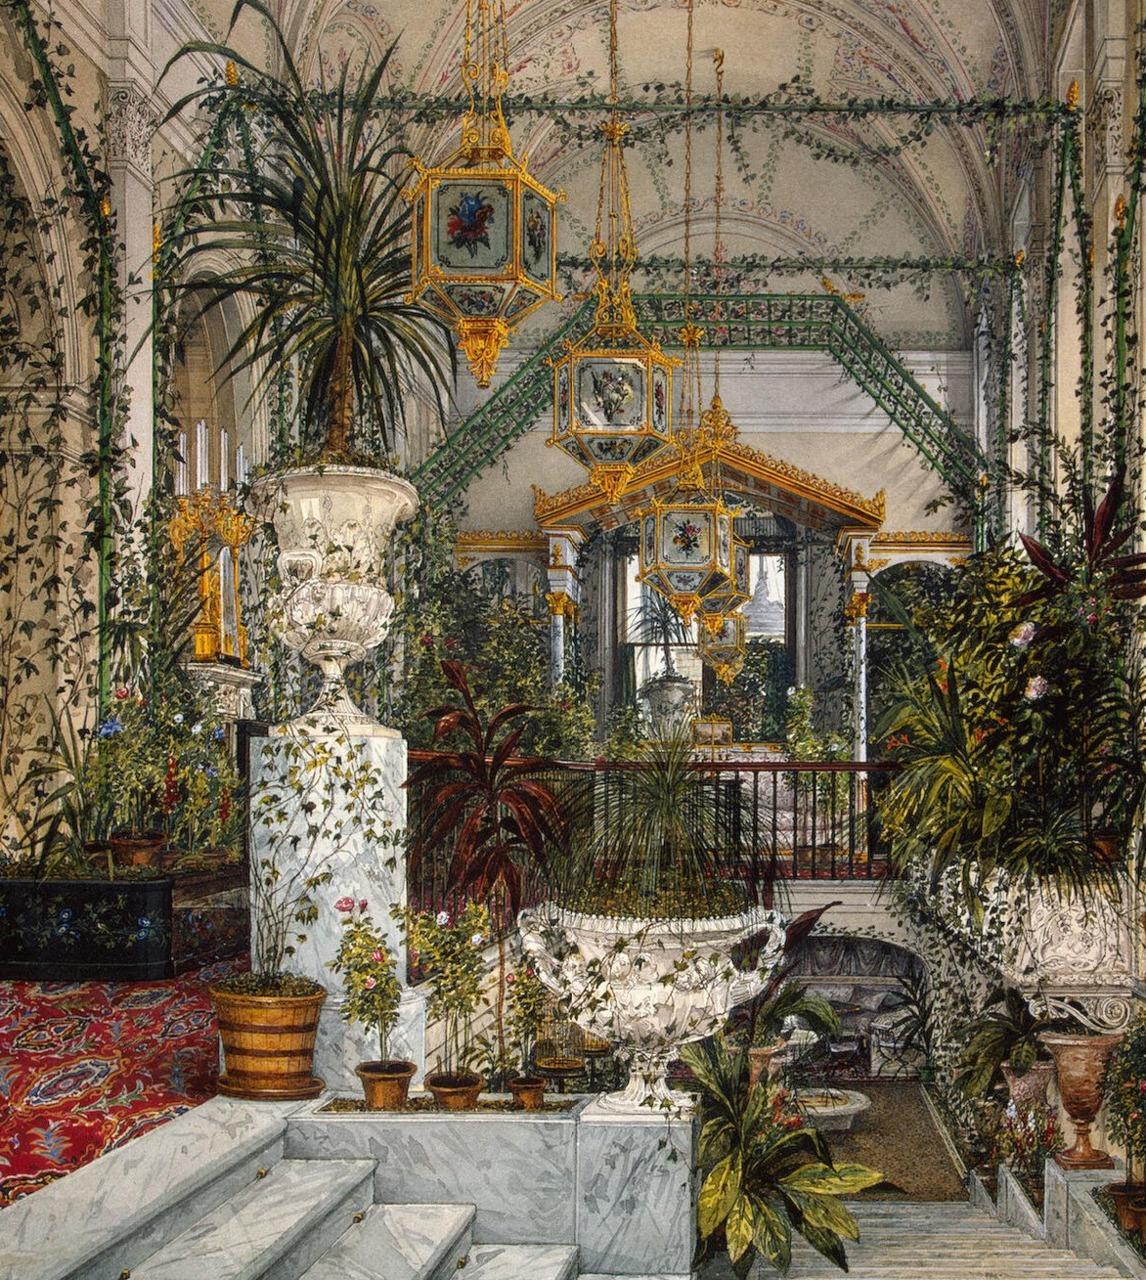 Winter Gardens | Cristopher Worthland Interiors